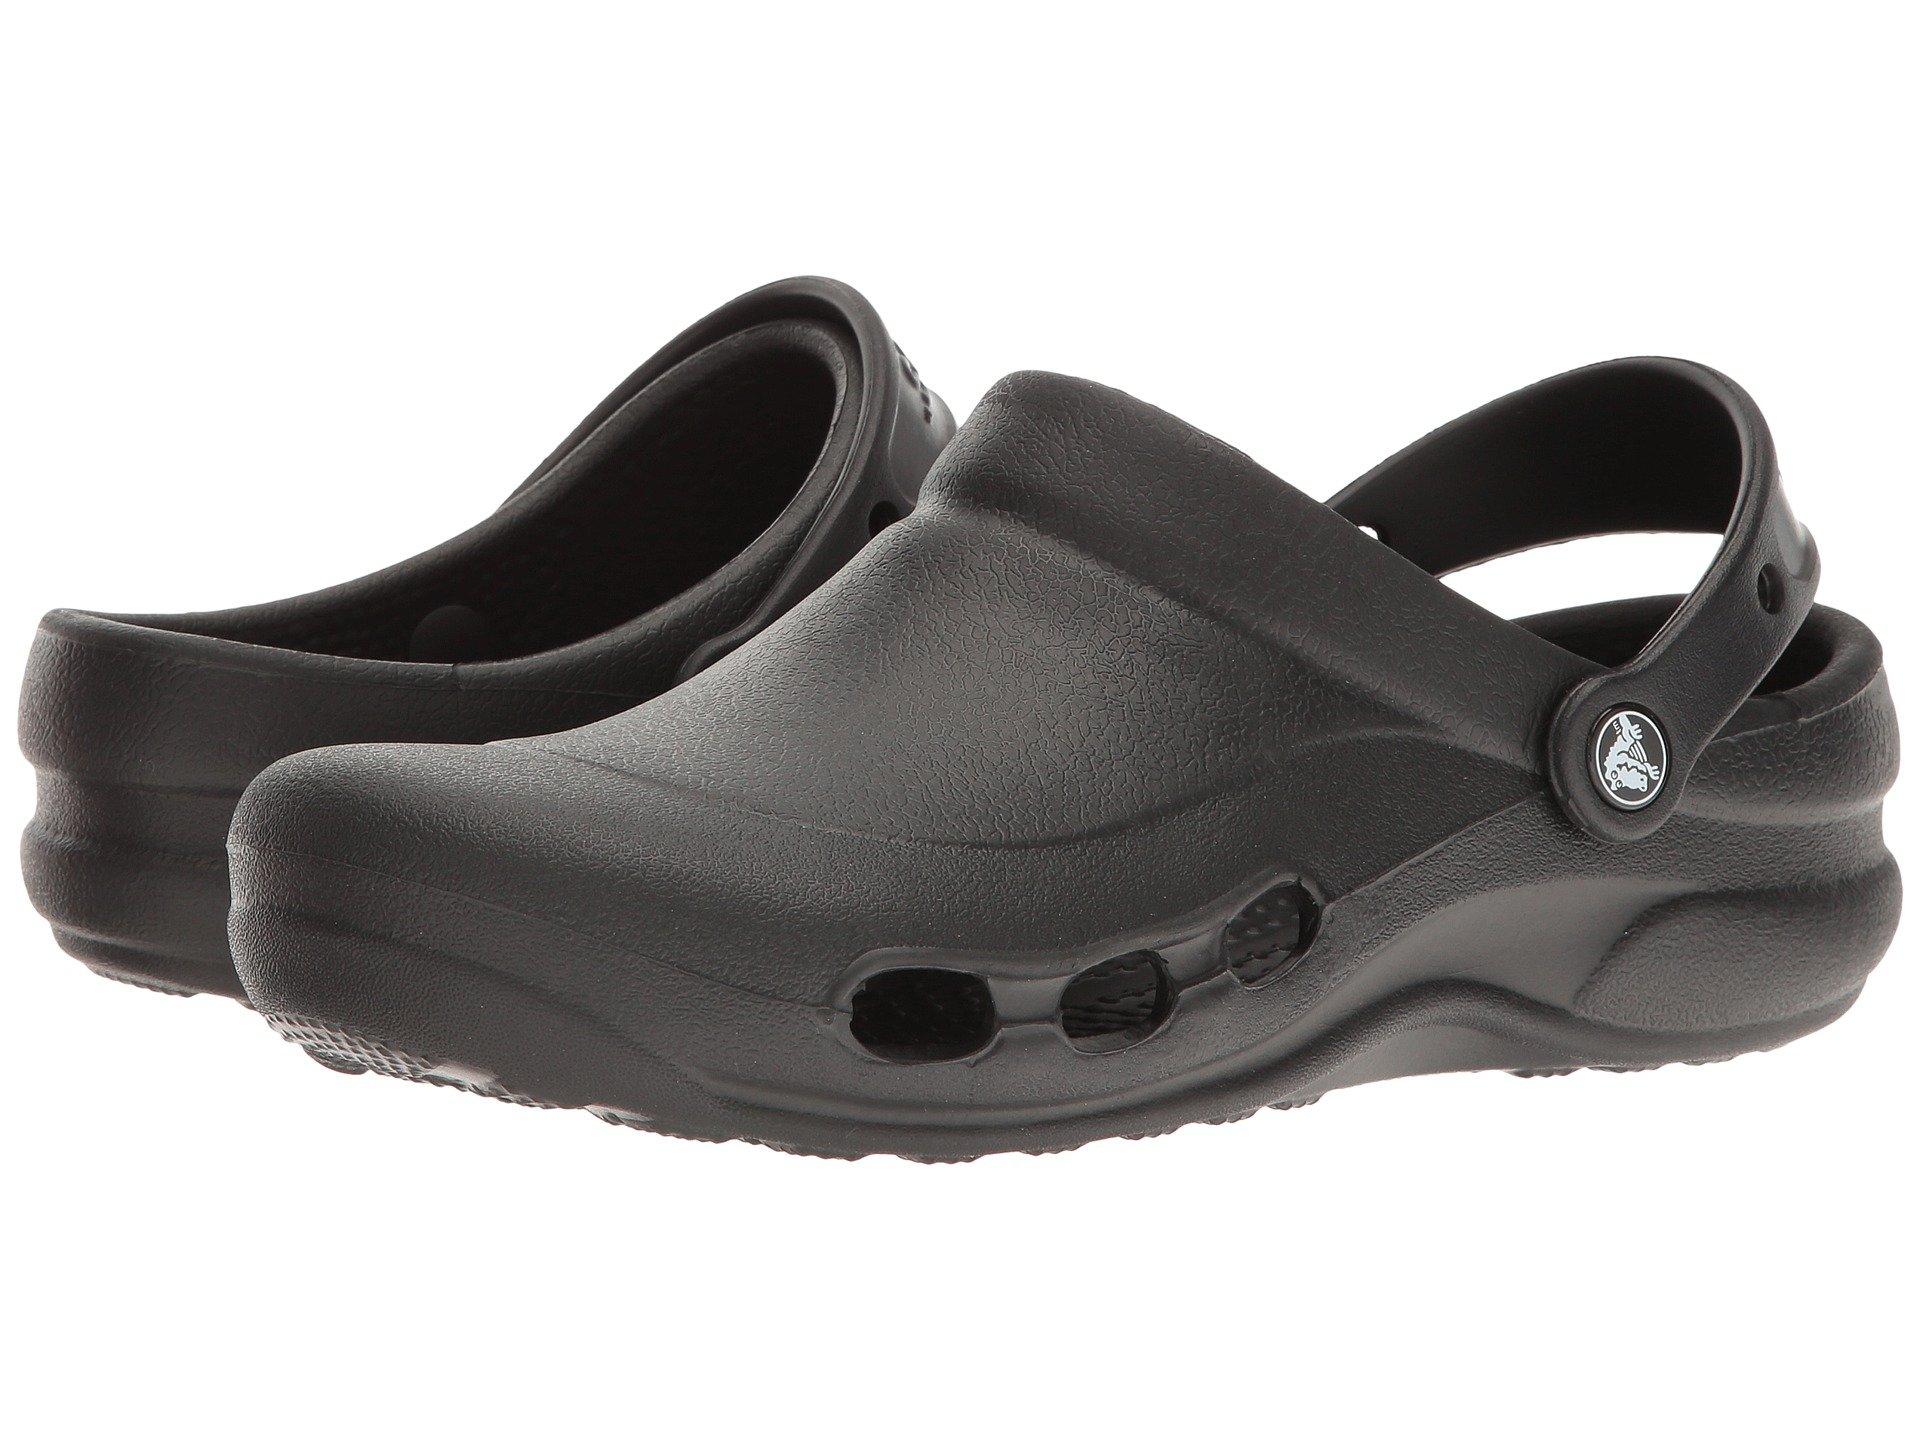 Crocs Specialist | Crocs Where to Buy | Orthopedic Crocs